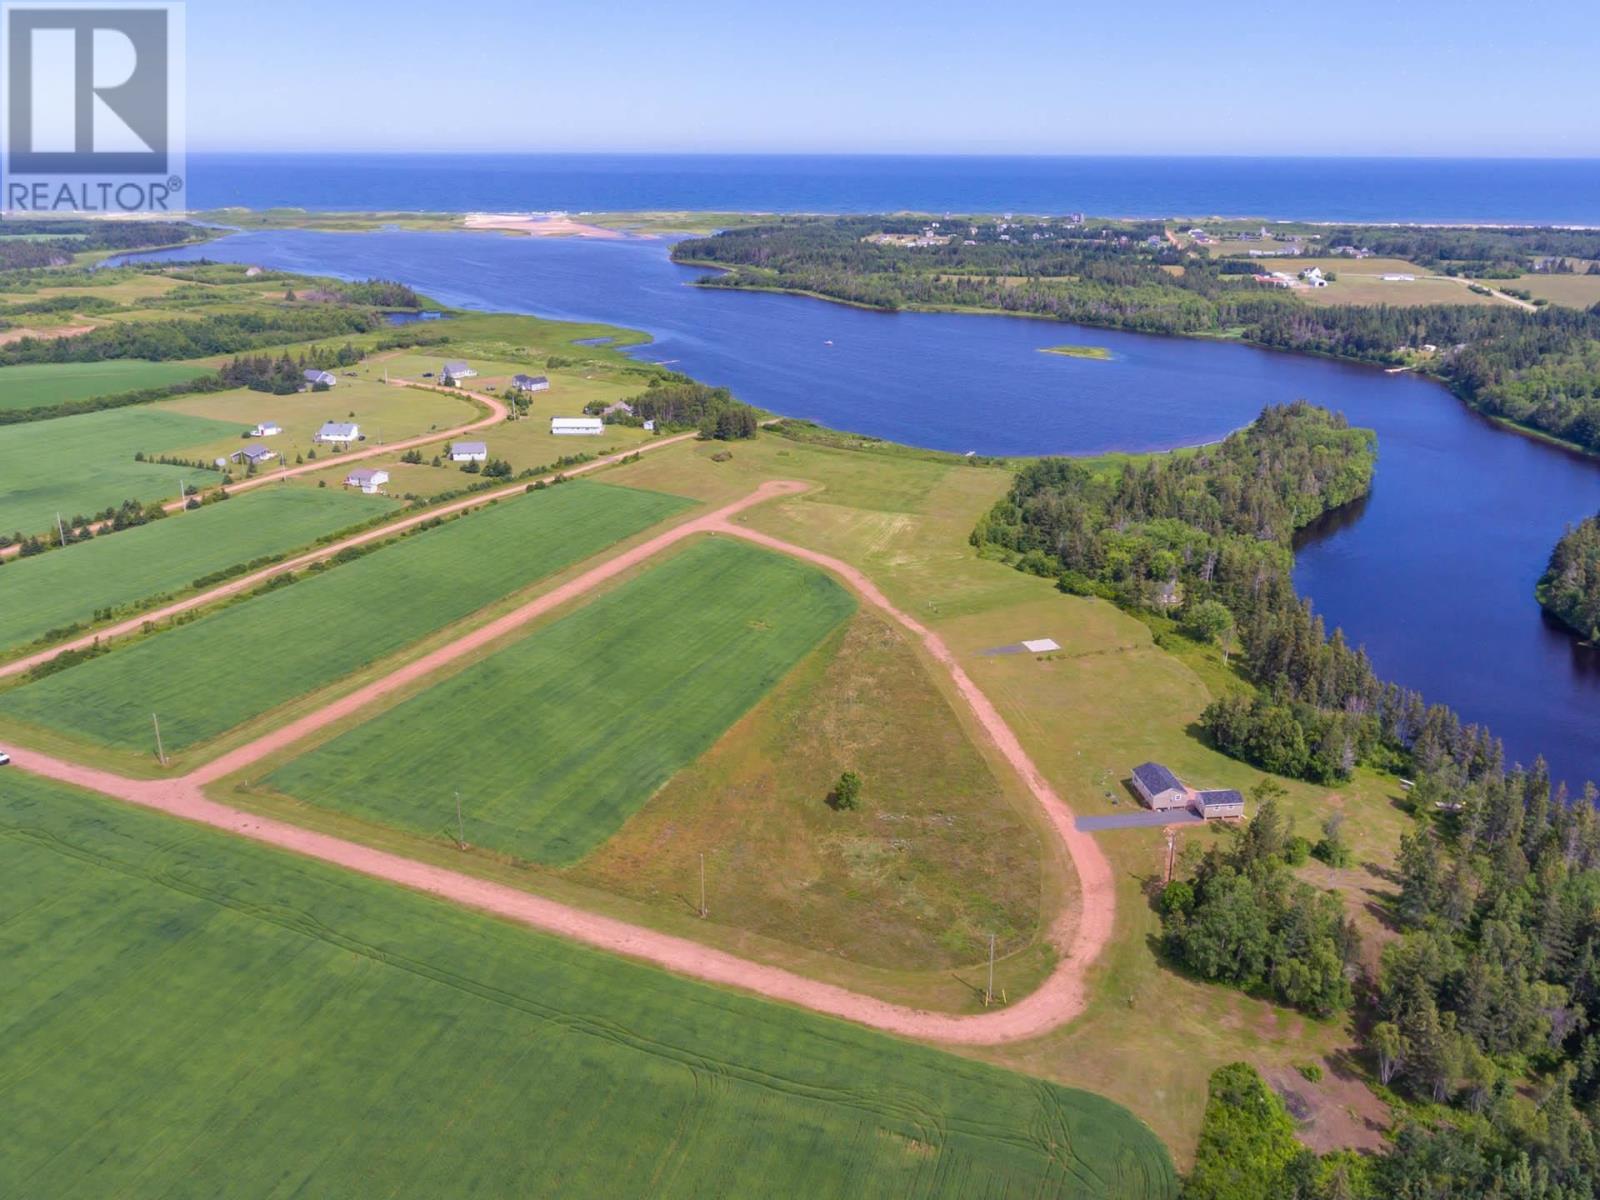 Lot 2 Majestic View Lane, Lakeside, Prince Edward Island  C0A 1S0 - Photo 3 - 202118512